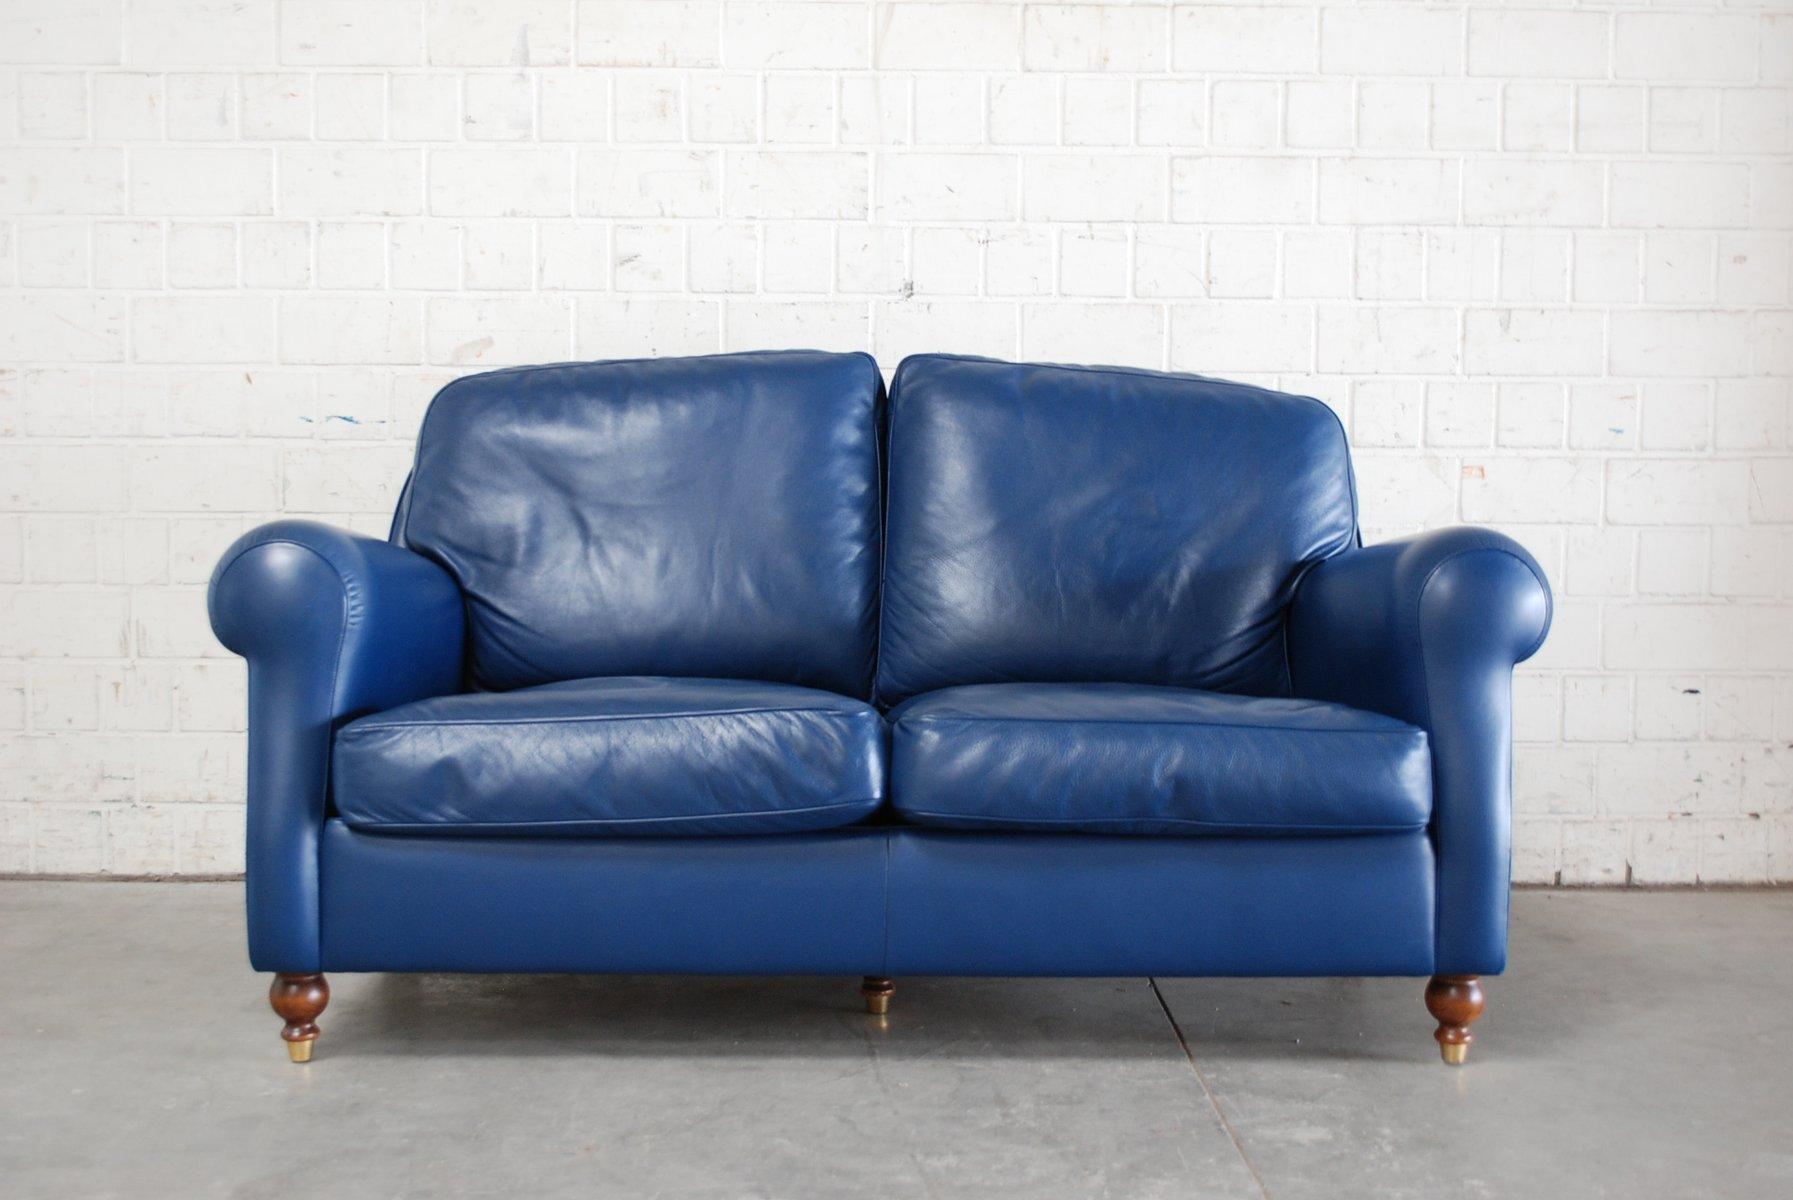 blaues george sofa aus leder von poltrona frau 1999 bei. Black Bedroom Furniture Sets. Home Design Ideas